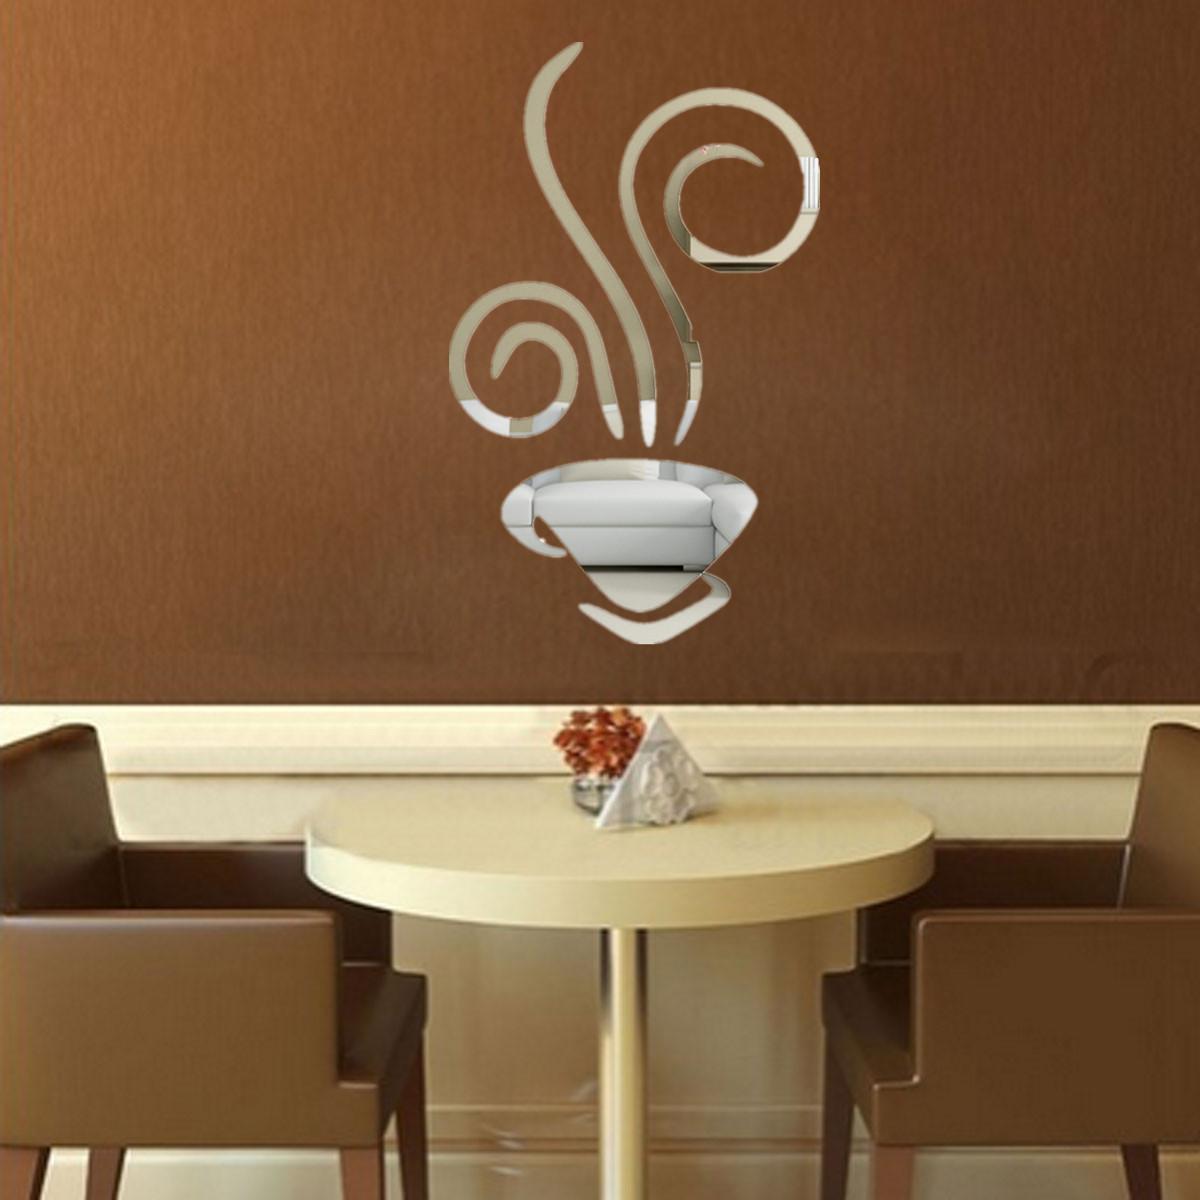 Tea coffee cup modern mirror wall home bar cafe decal for Tea and coffee wall art